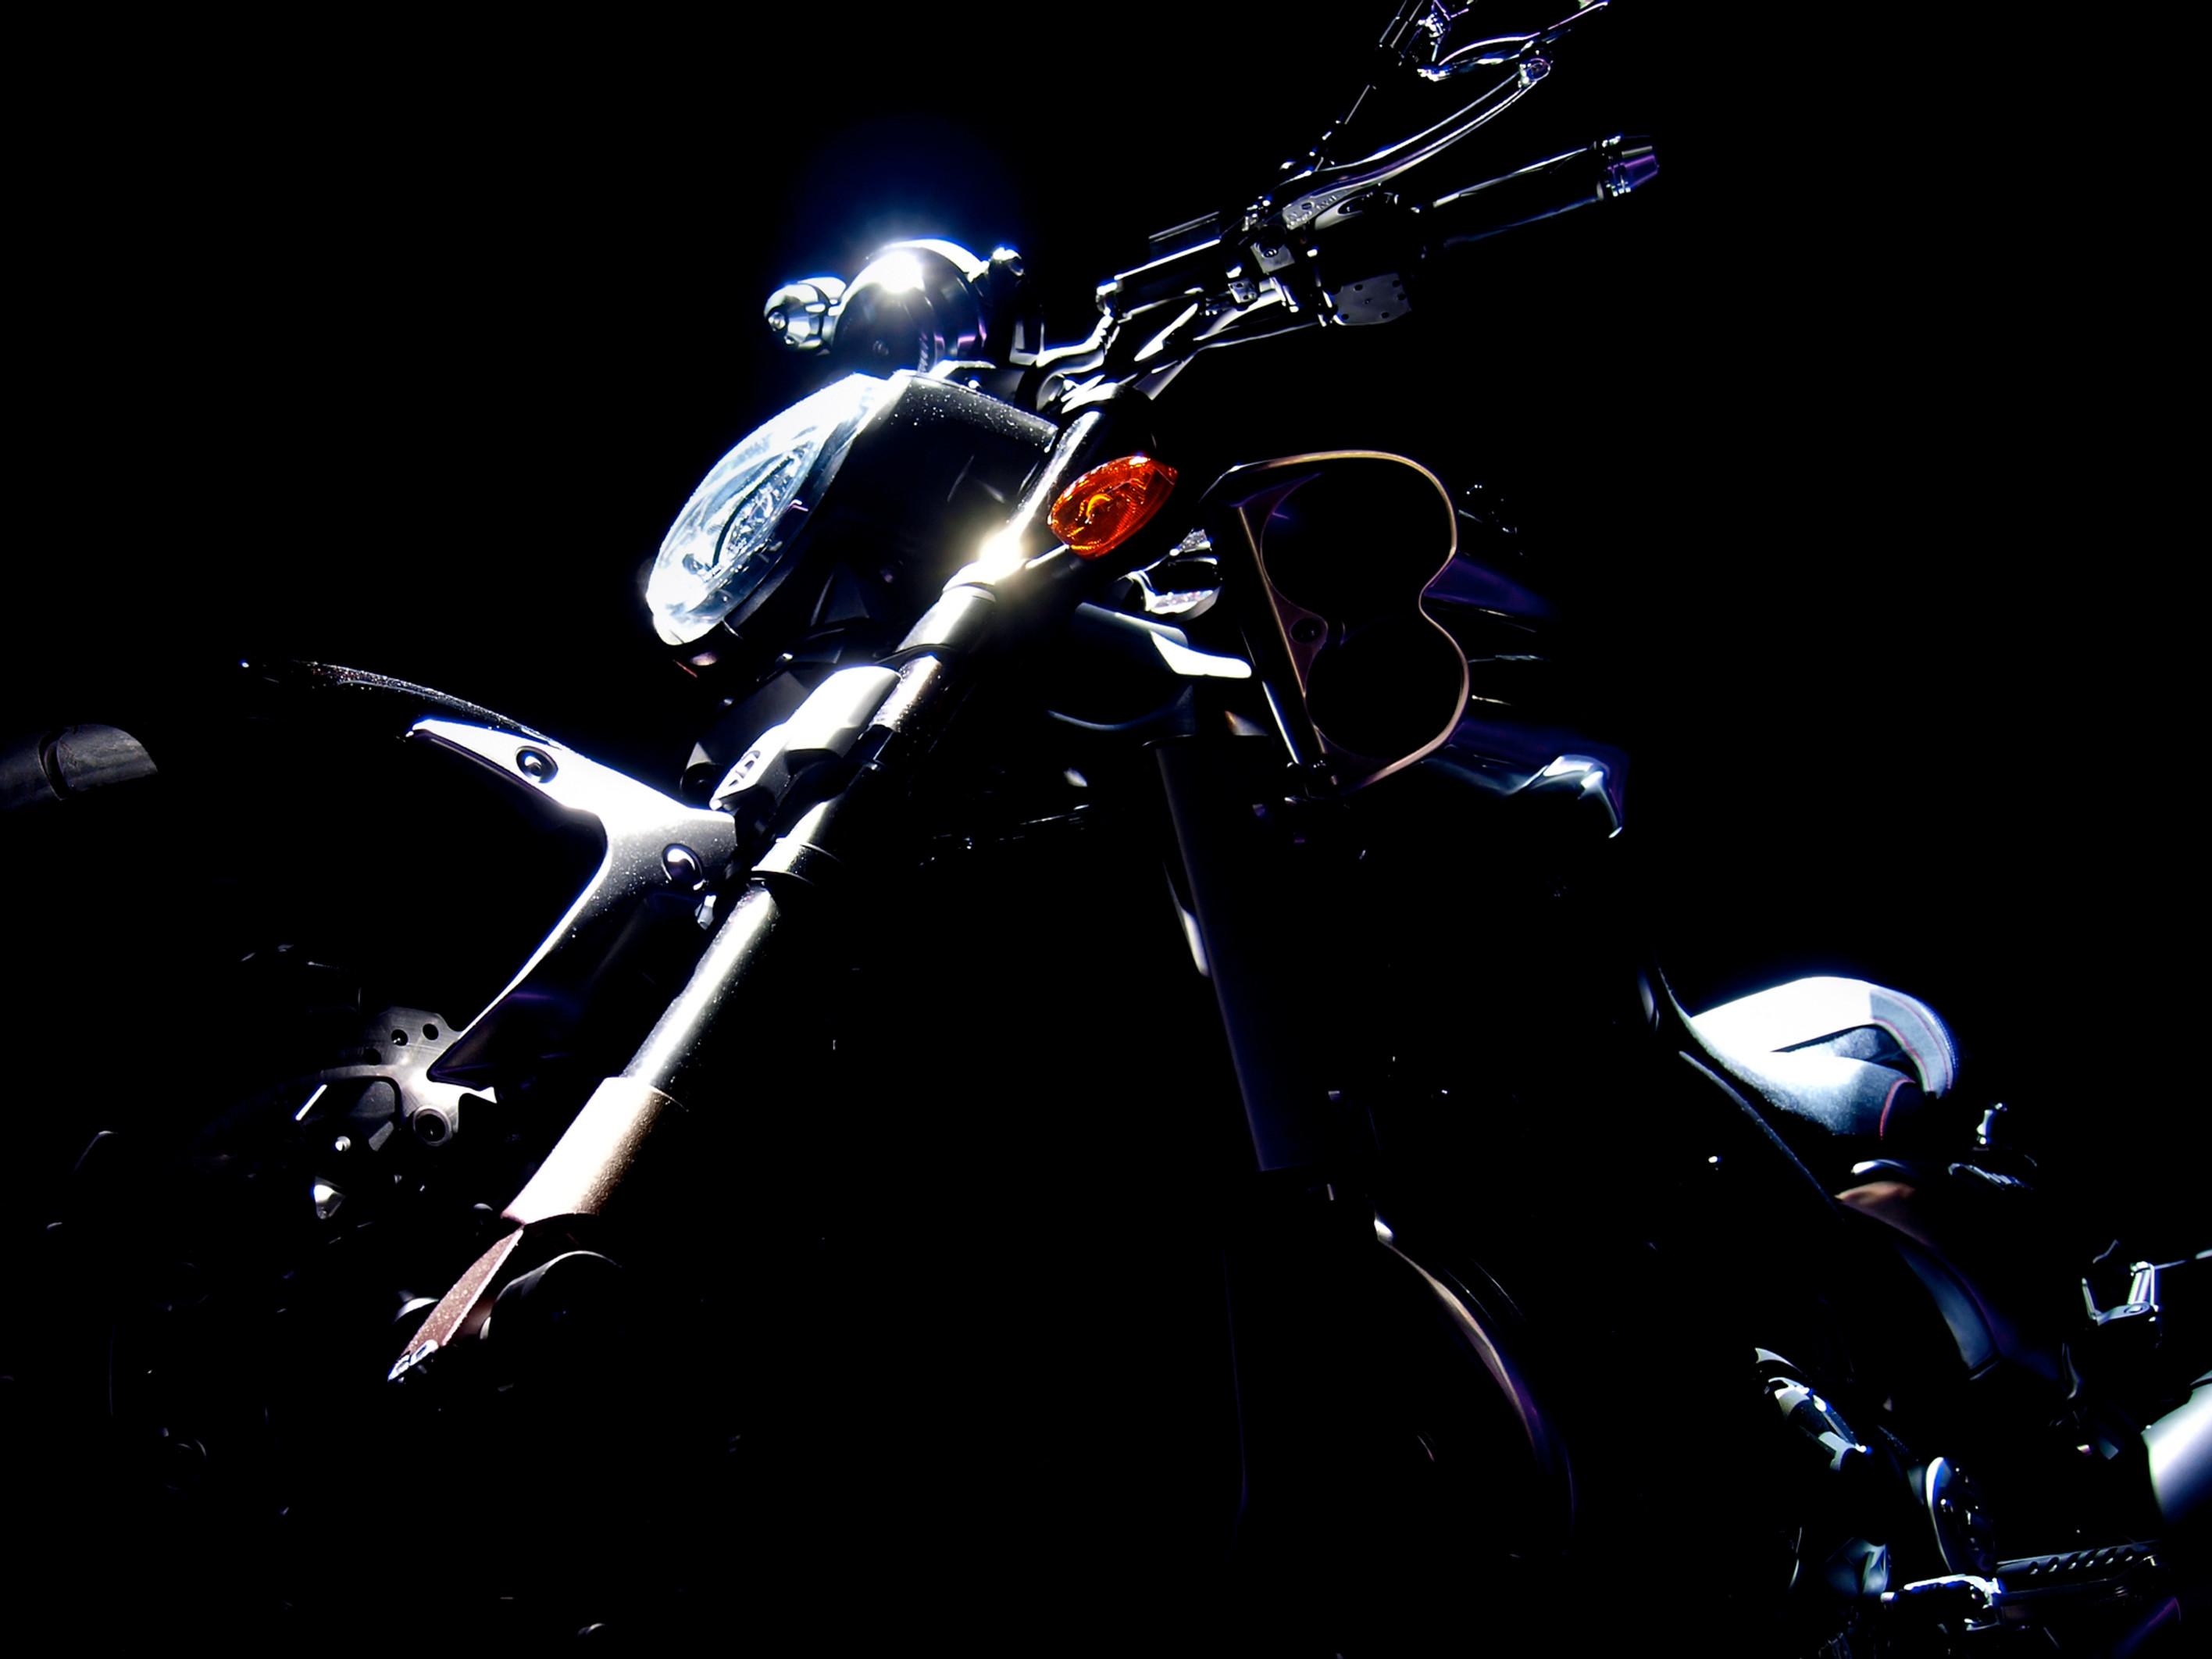 Motorcycle & Sidecar Training